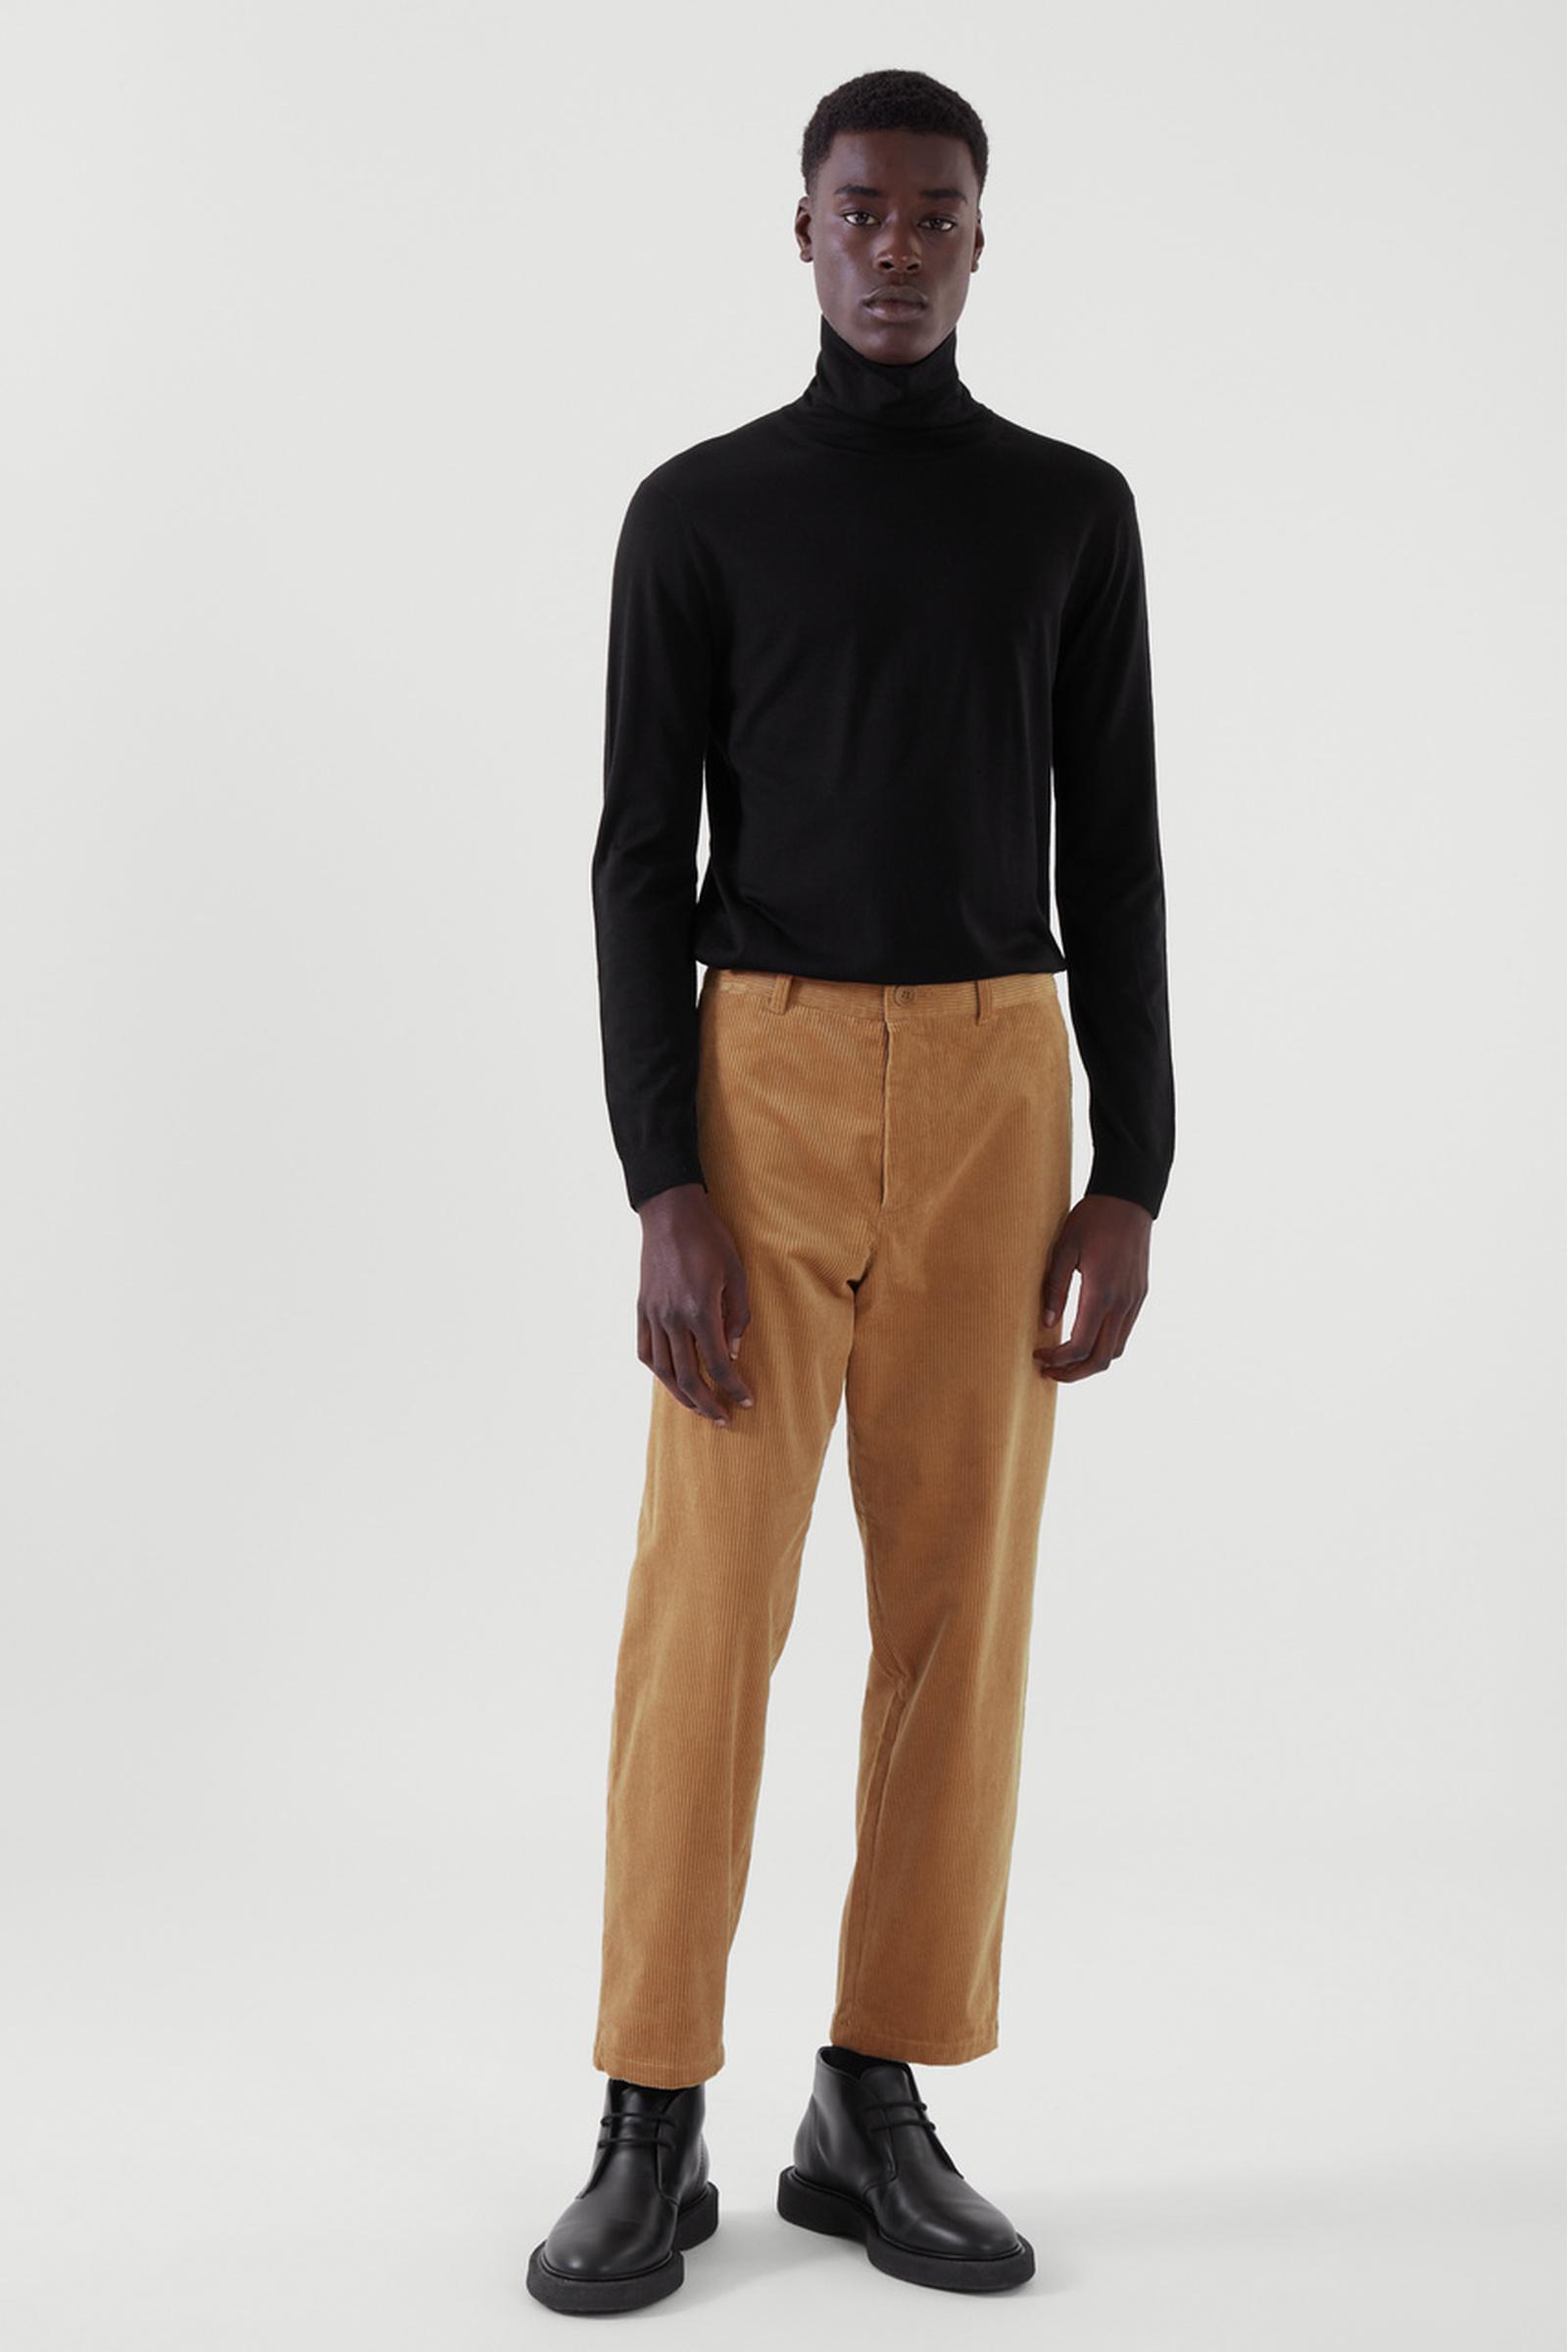 COS 메리노 롤넥 스웨터의 블랙컬러 ECOMLook입니다.